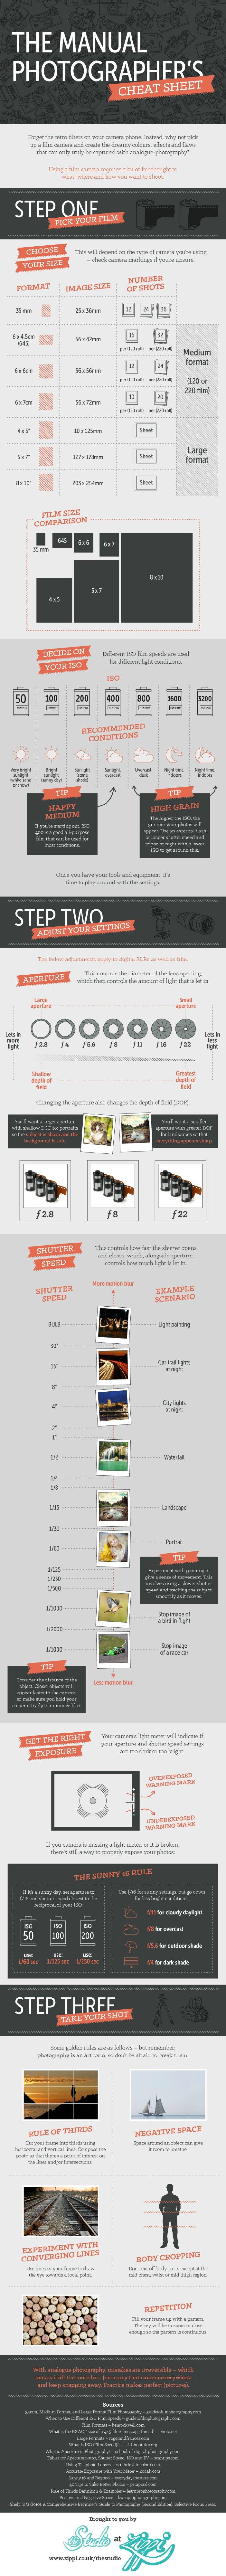 1the-manual-photographers-cheat-sheet-1.jpg